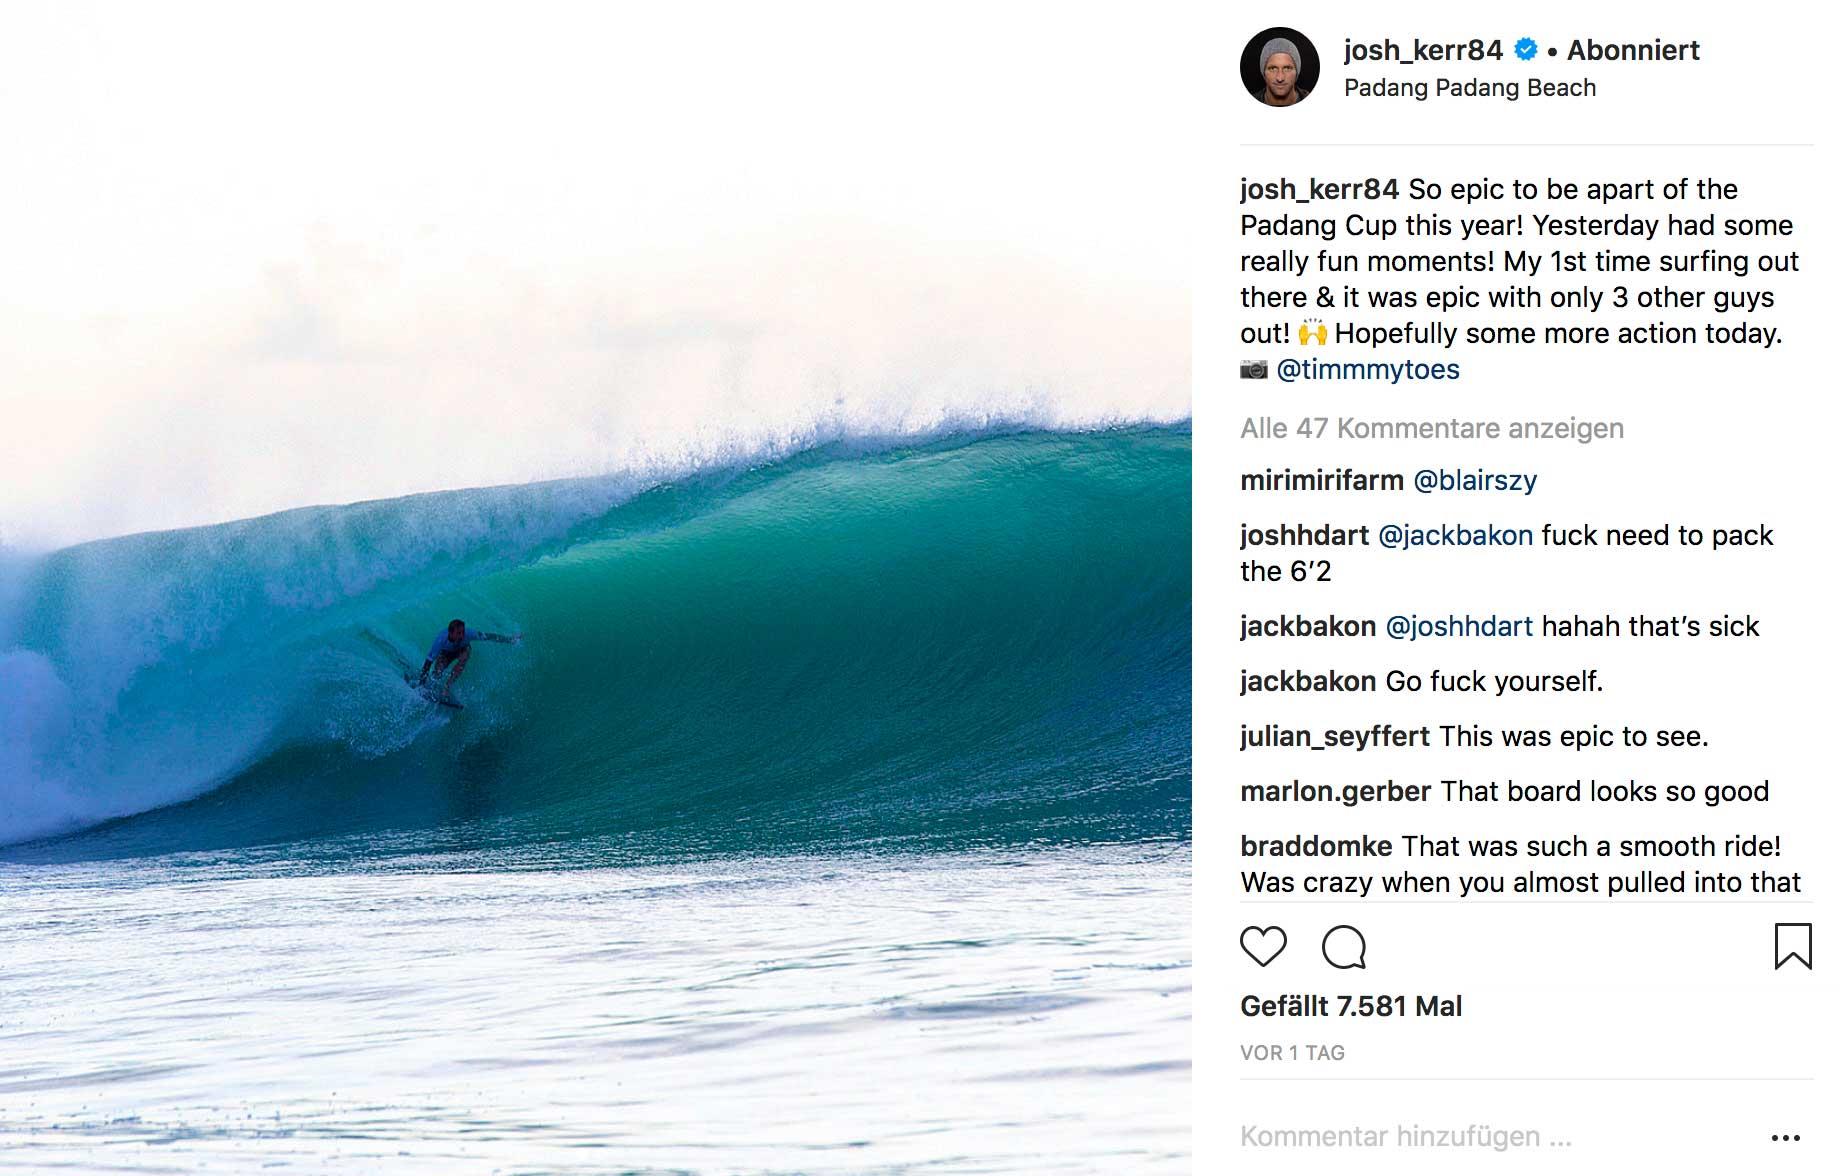 Josh Kerr in seinem Heat in Padang Padang am Sonntag. Der Tag, an dem er diesen Spot zum ersten Mal surfte.